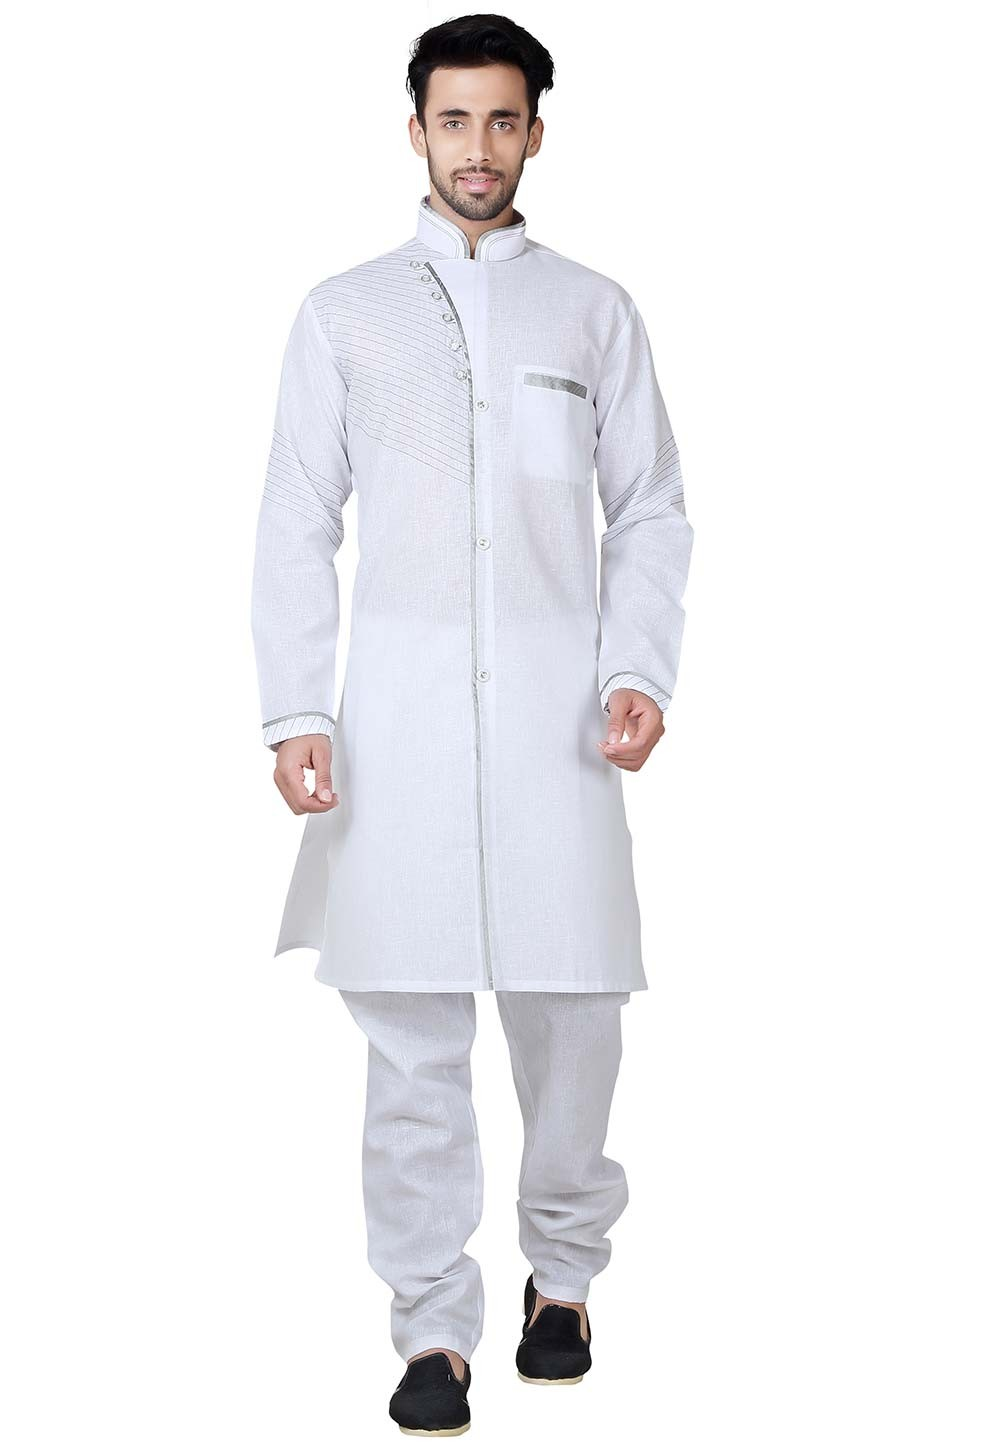 Exquisite White Color Cotton,Linen Fabric Pathani Kurta Pajama Online